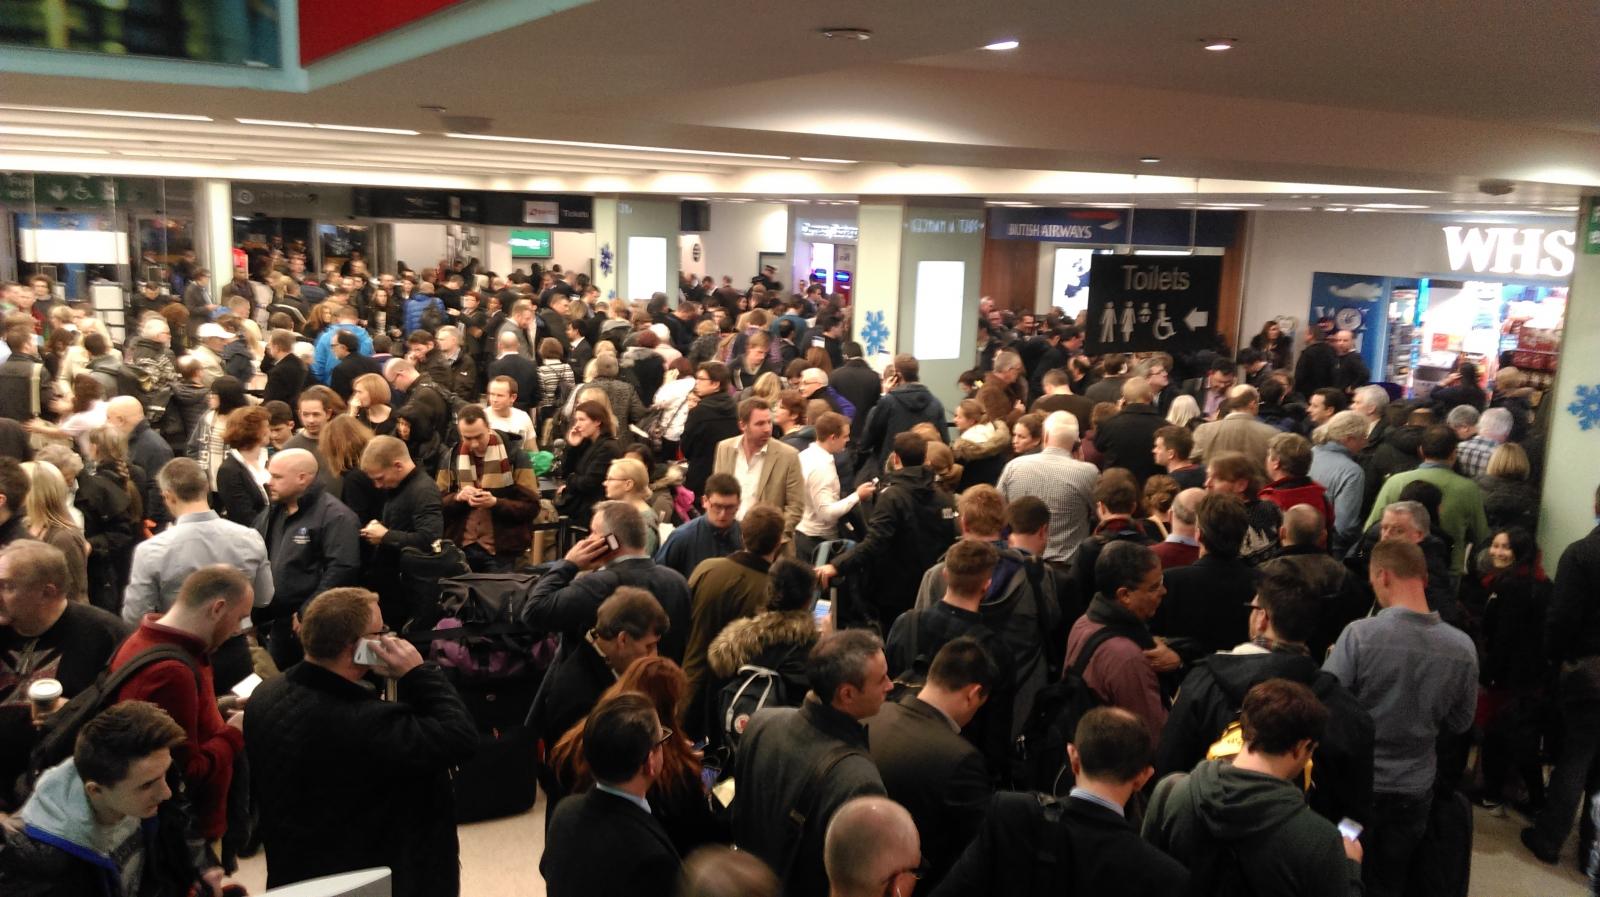 City Airport disruption